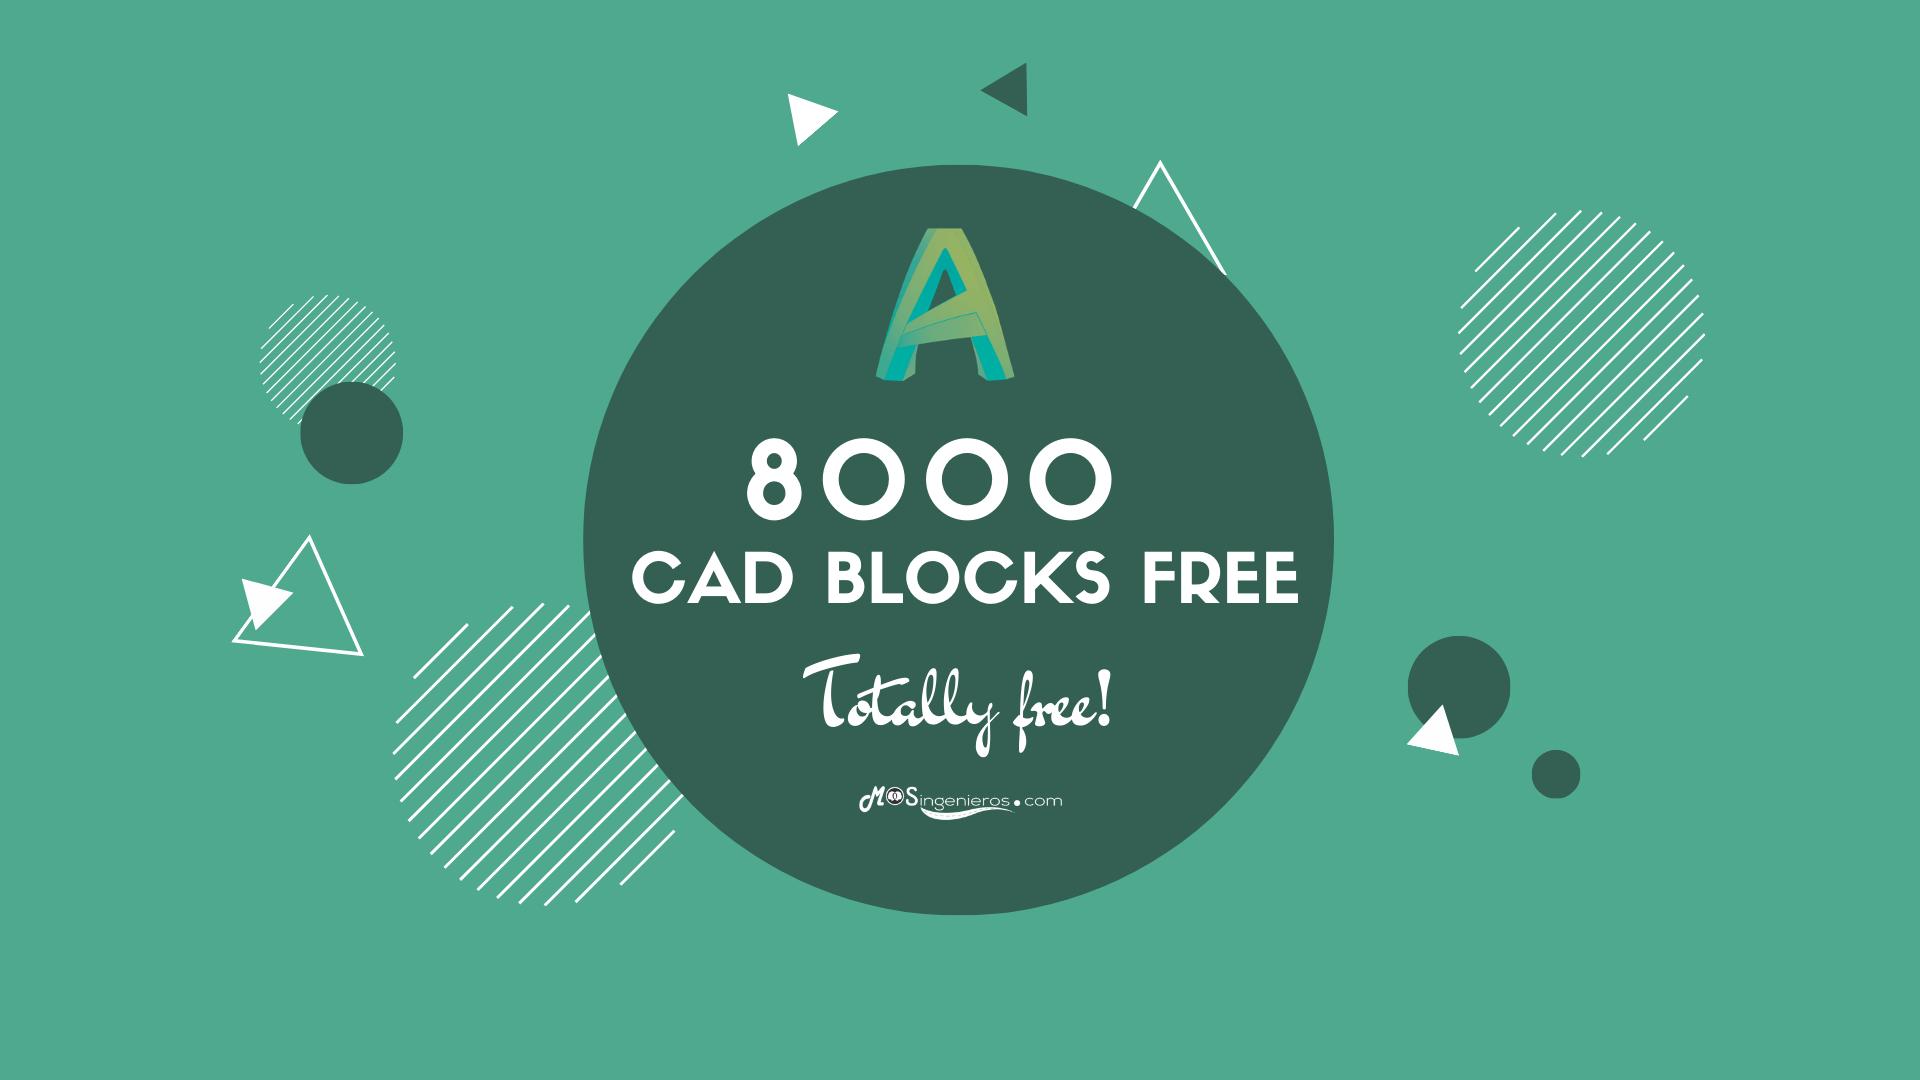 cad blocks free